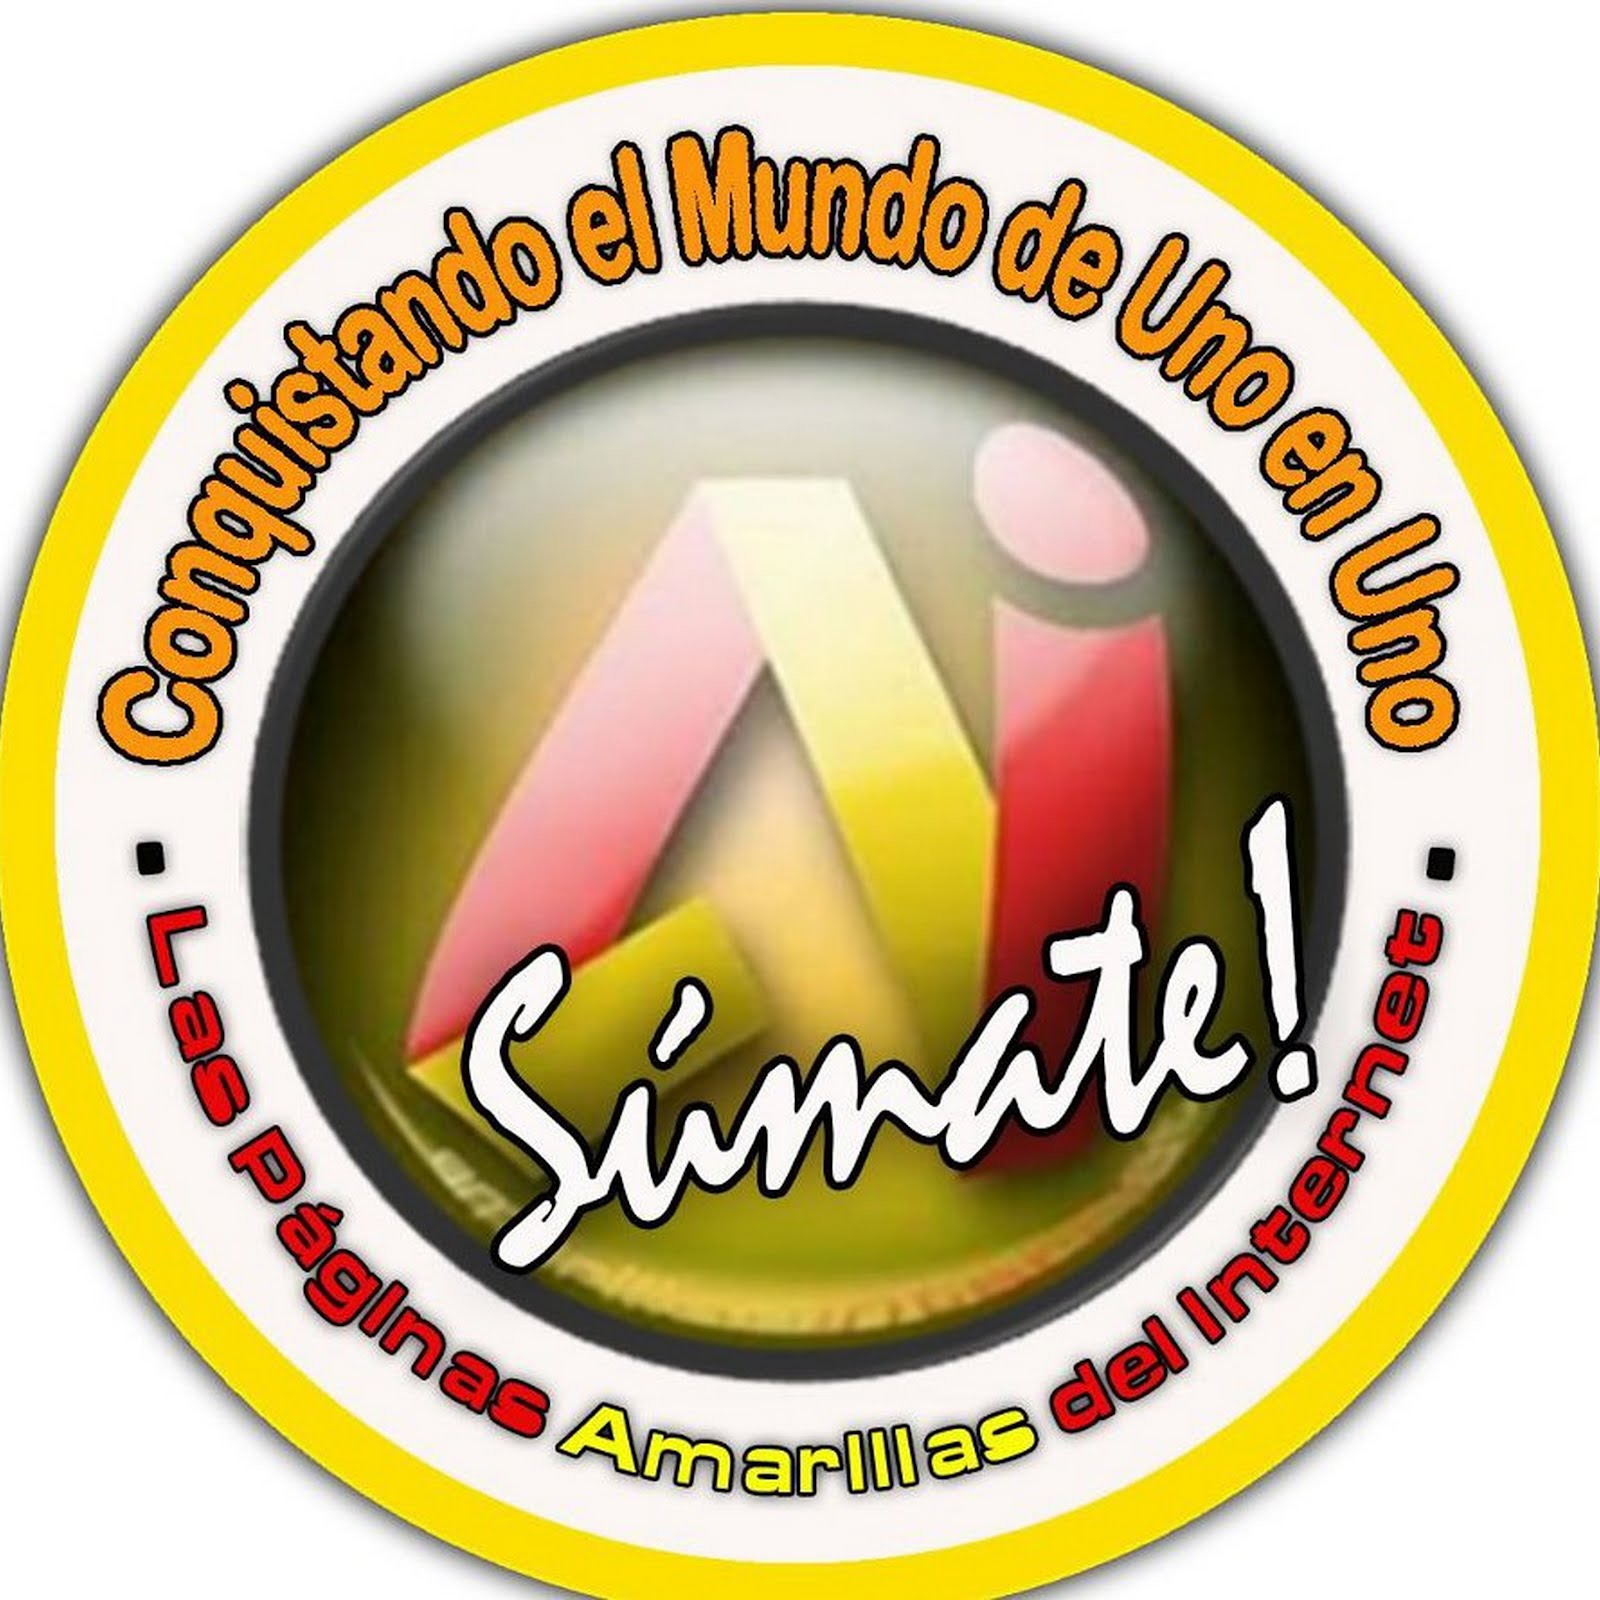 http://4.bp.blogspot.com/-ZTtsepuW3Hc/UB35enIuHiI/AAAAAAAAO6s/KC7D9gJOPeM/s1600/AmarillasInternet.jpg